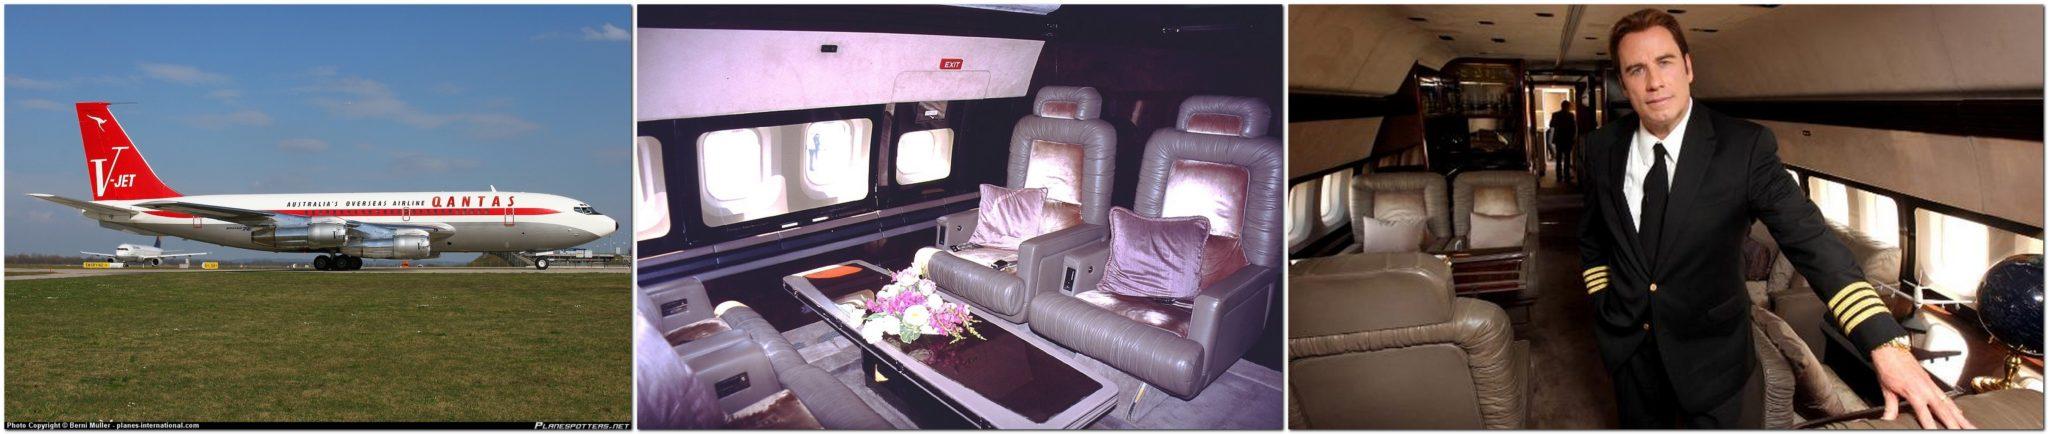 John Travolta, Boeing 707